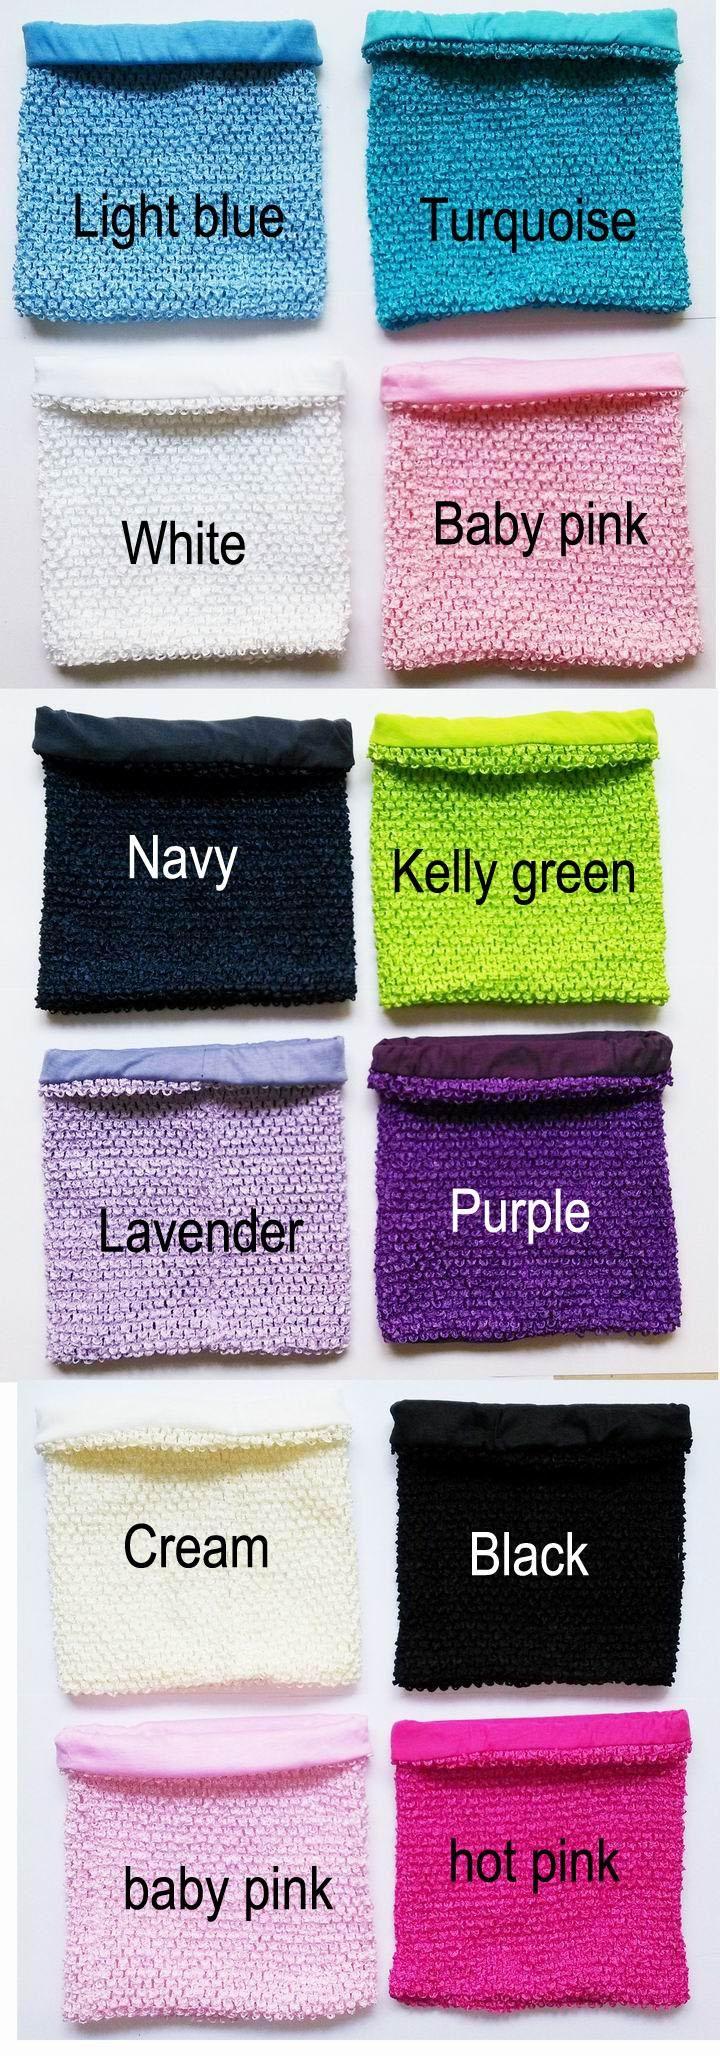 Wholesale 10x12 inches Large size lined Crochet tube top lined tutu top for girls' tutu dress crochet pettiskirt tutu tops 50pcs per lot free shipping, Free shipping, $3.1/Piece | DHgate Mobile